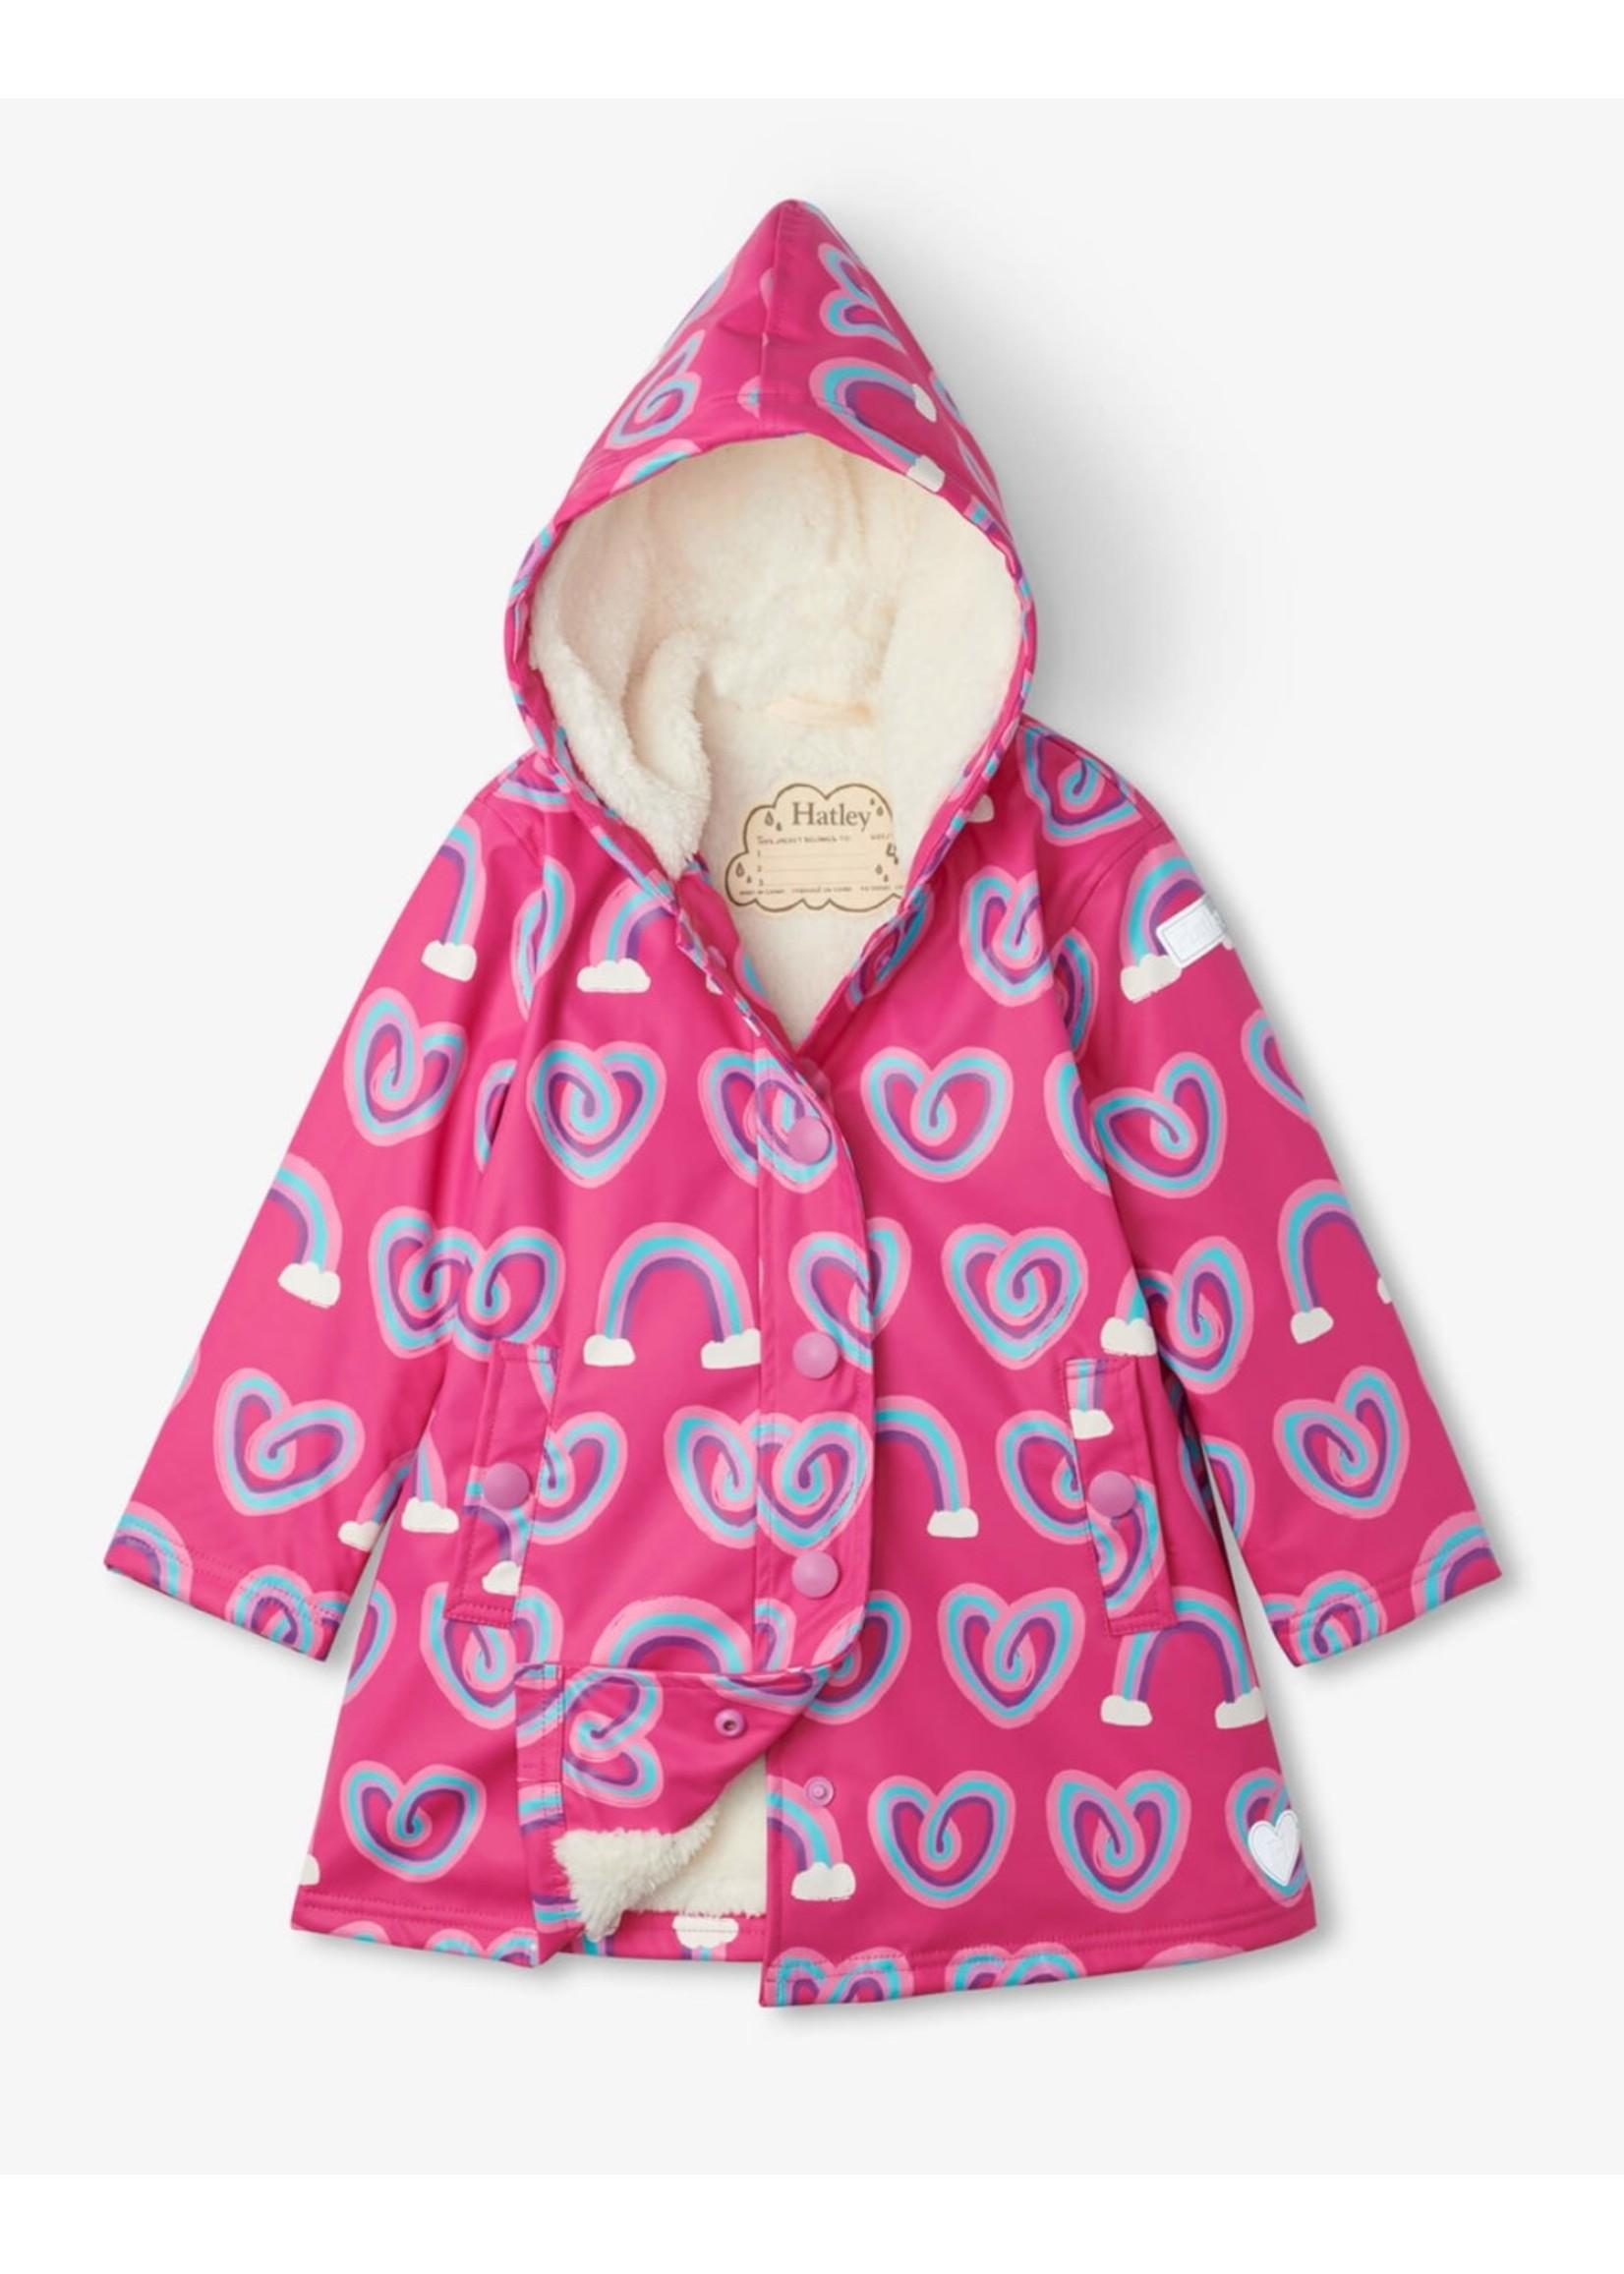 Hatley Hatley, Twisty Rainbow Hearts Sherpa Lined Splash Jacket